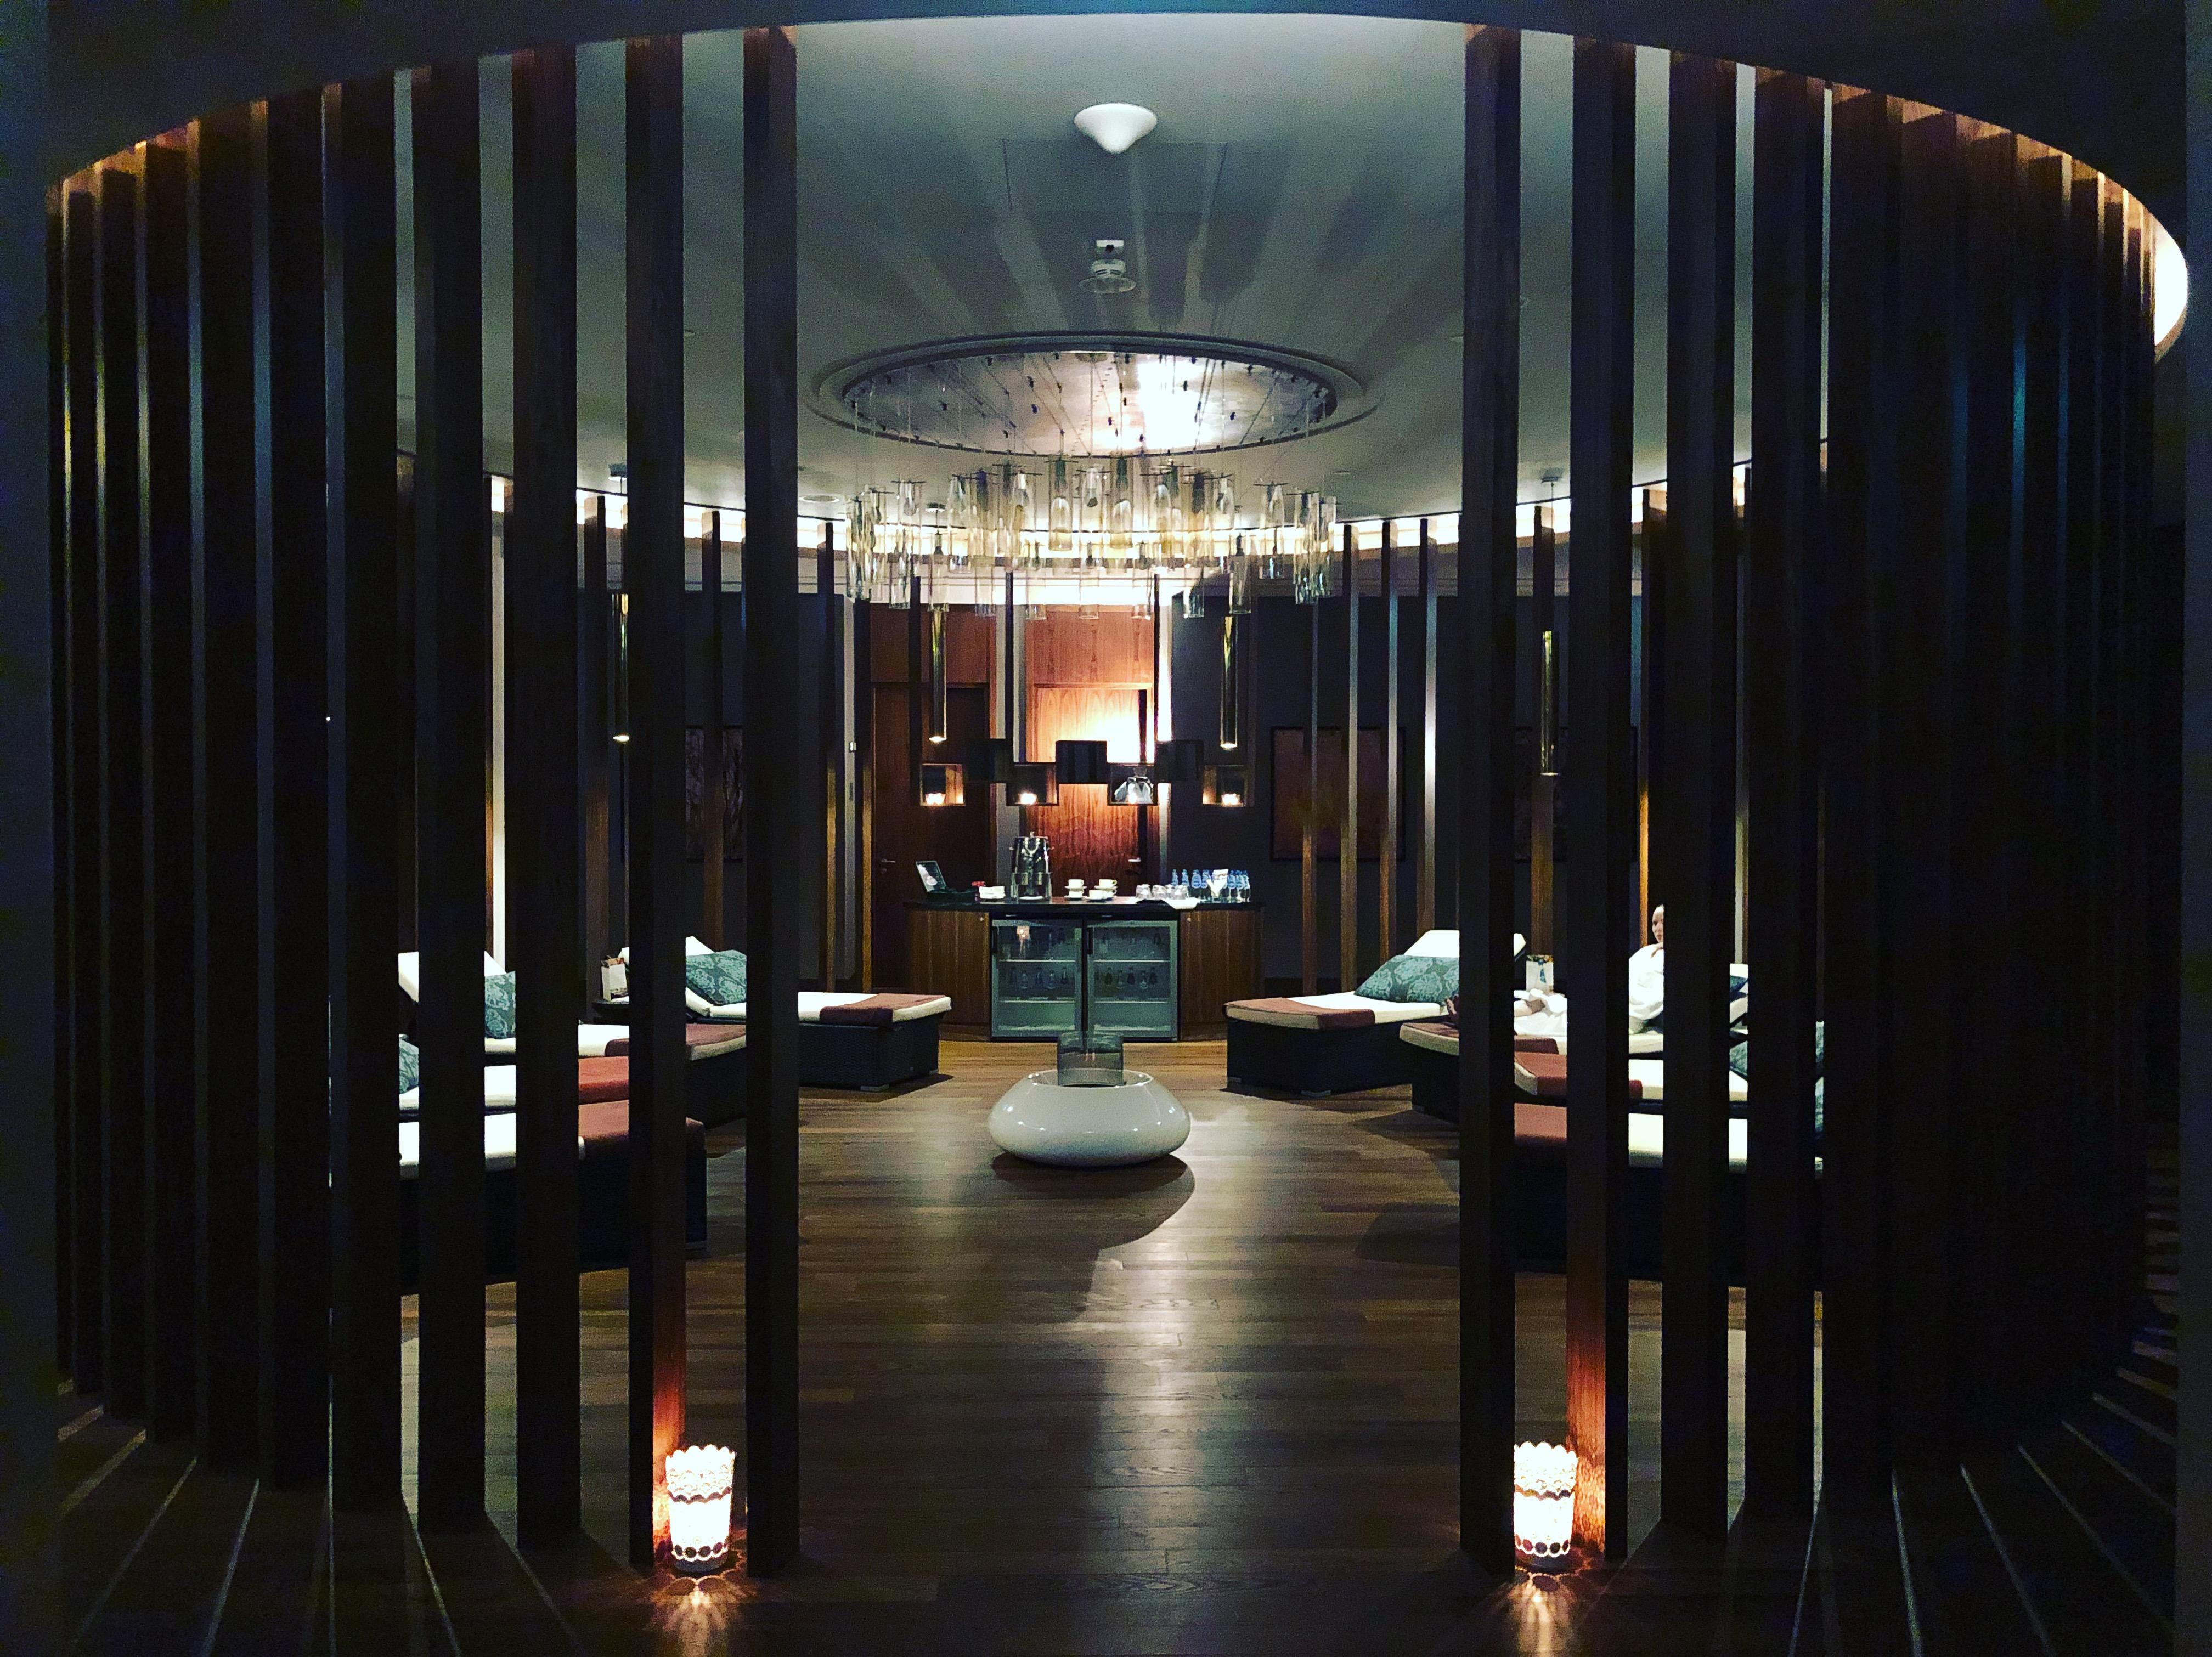 DoubleTree by Hilton Warsaw